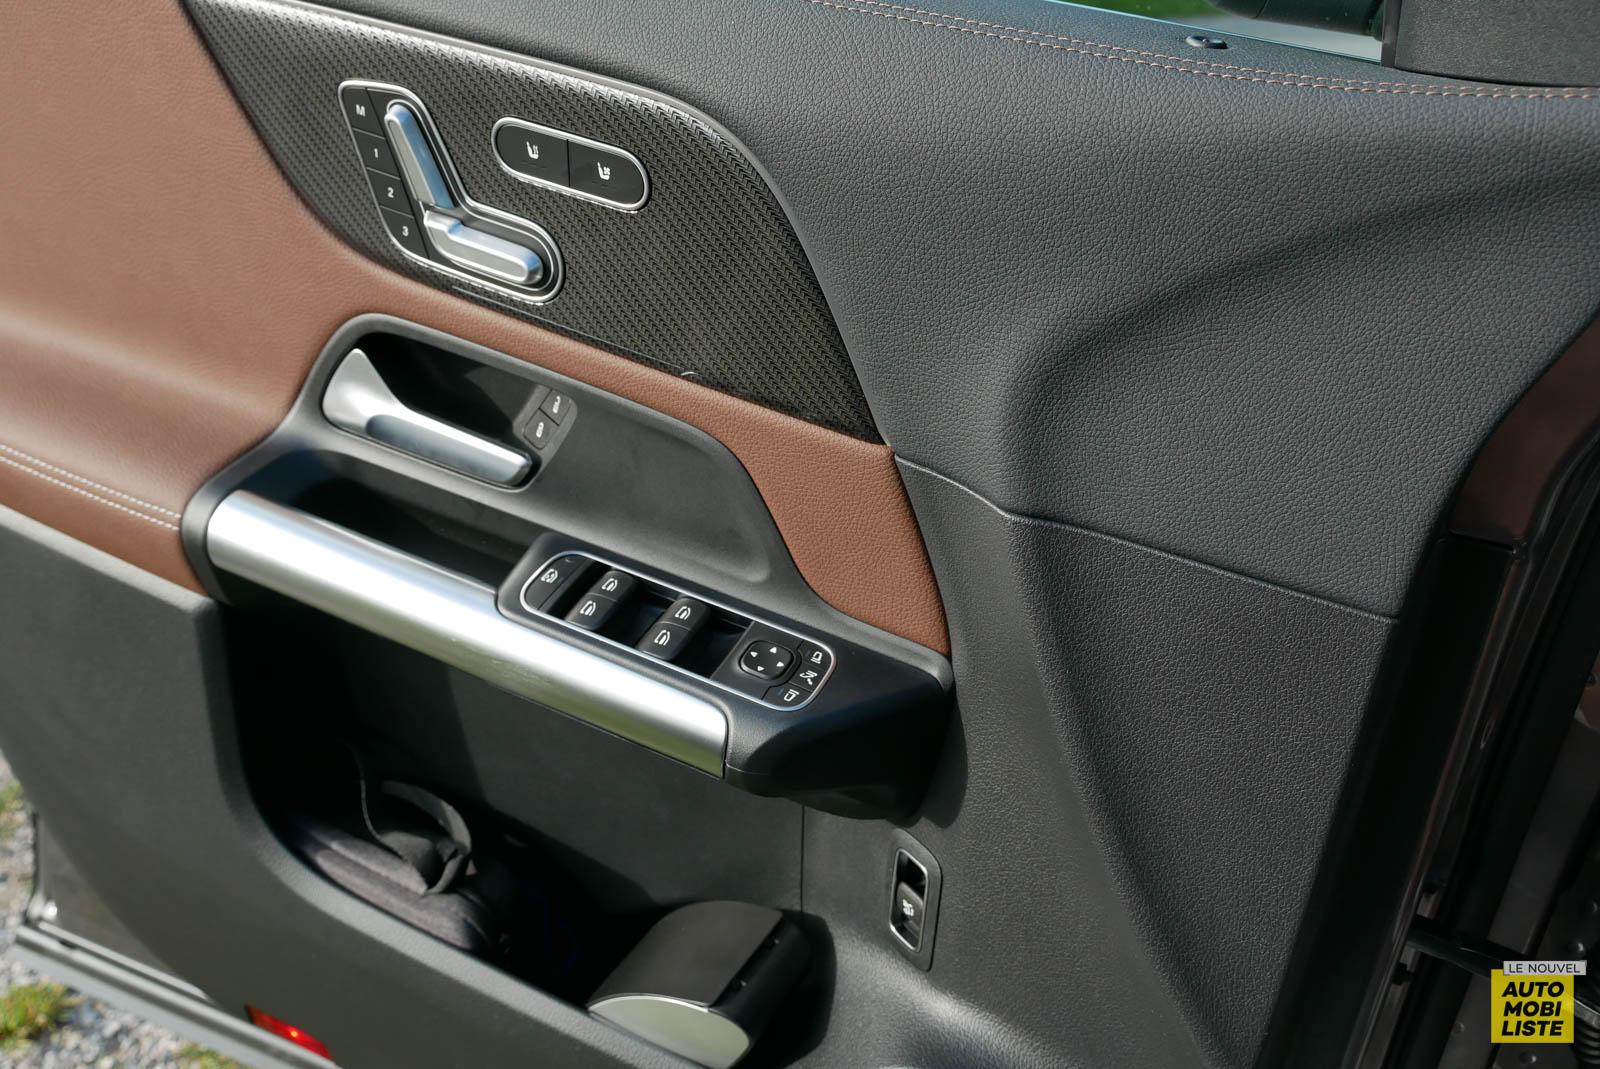 LNA 2007 Mercedes GLA Interieur Detail 003